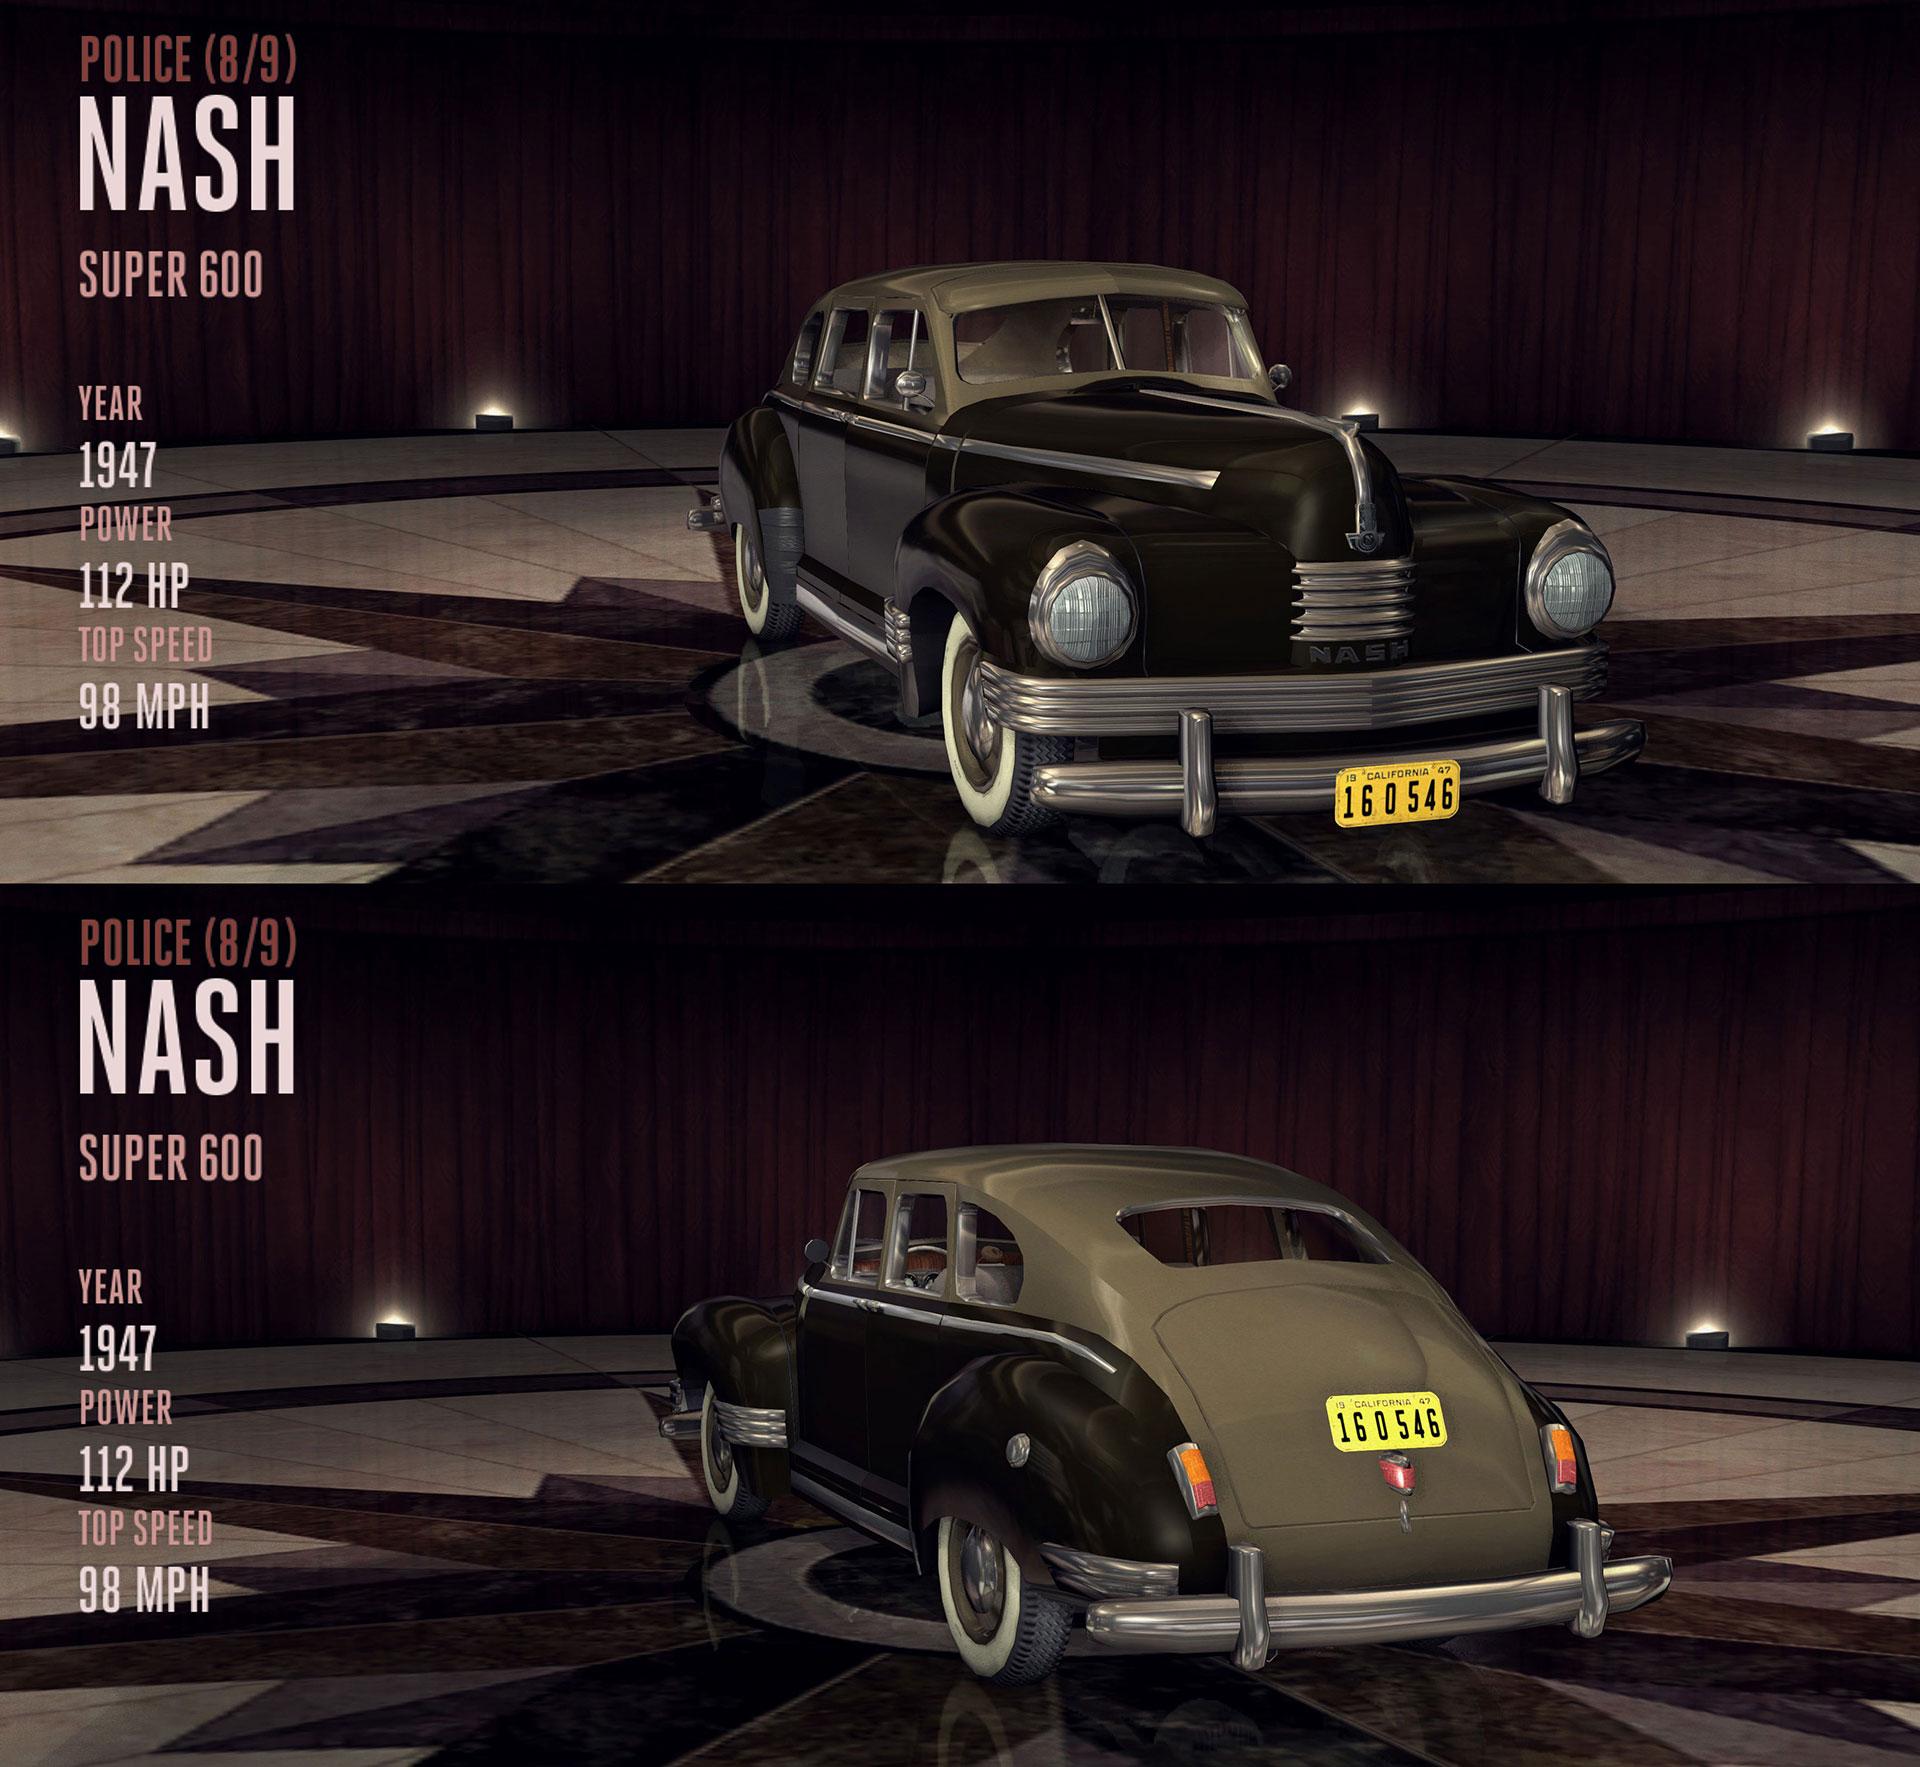 Archivo:1947-nash-super-600.jpg